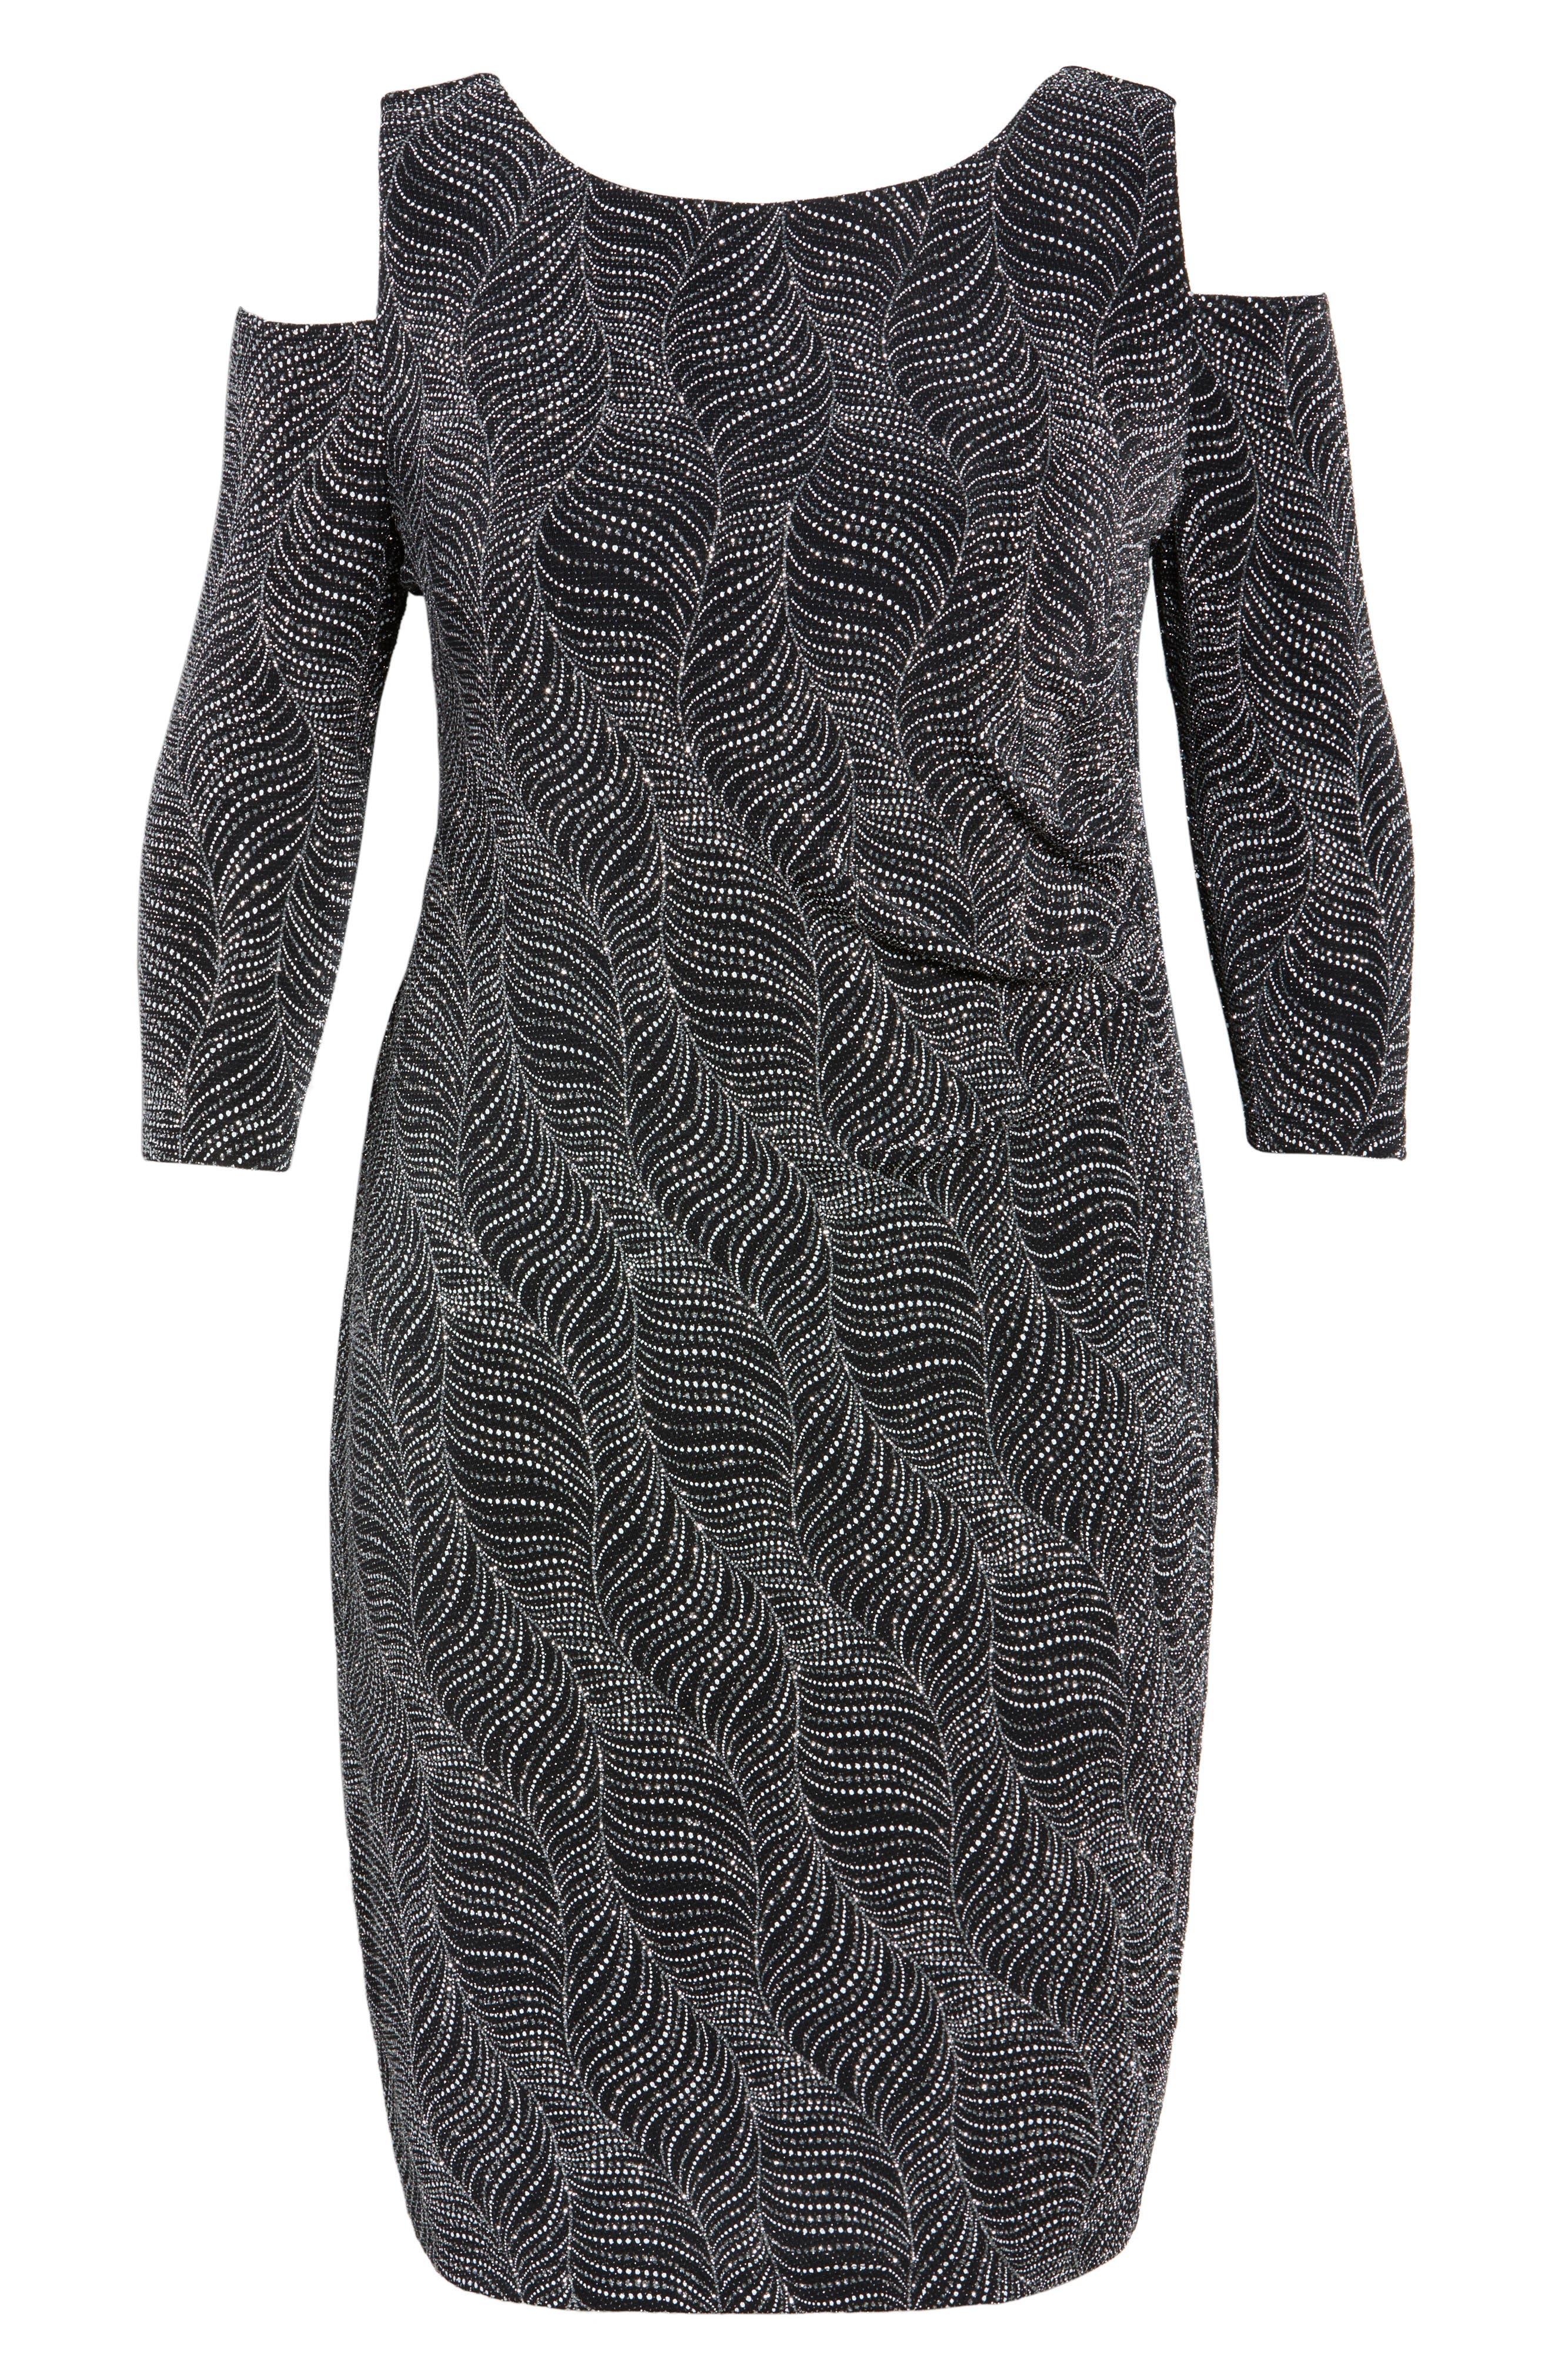 Cold Shoulder Glitter Knit Sheath Dress,                             Alternate thumbnail 6, color,                             Black/ Silver